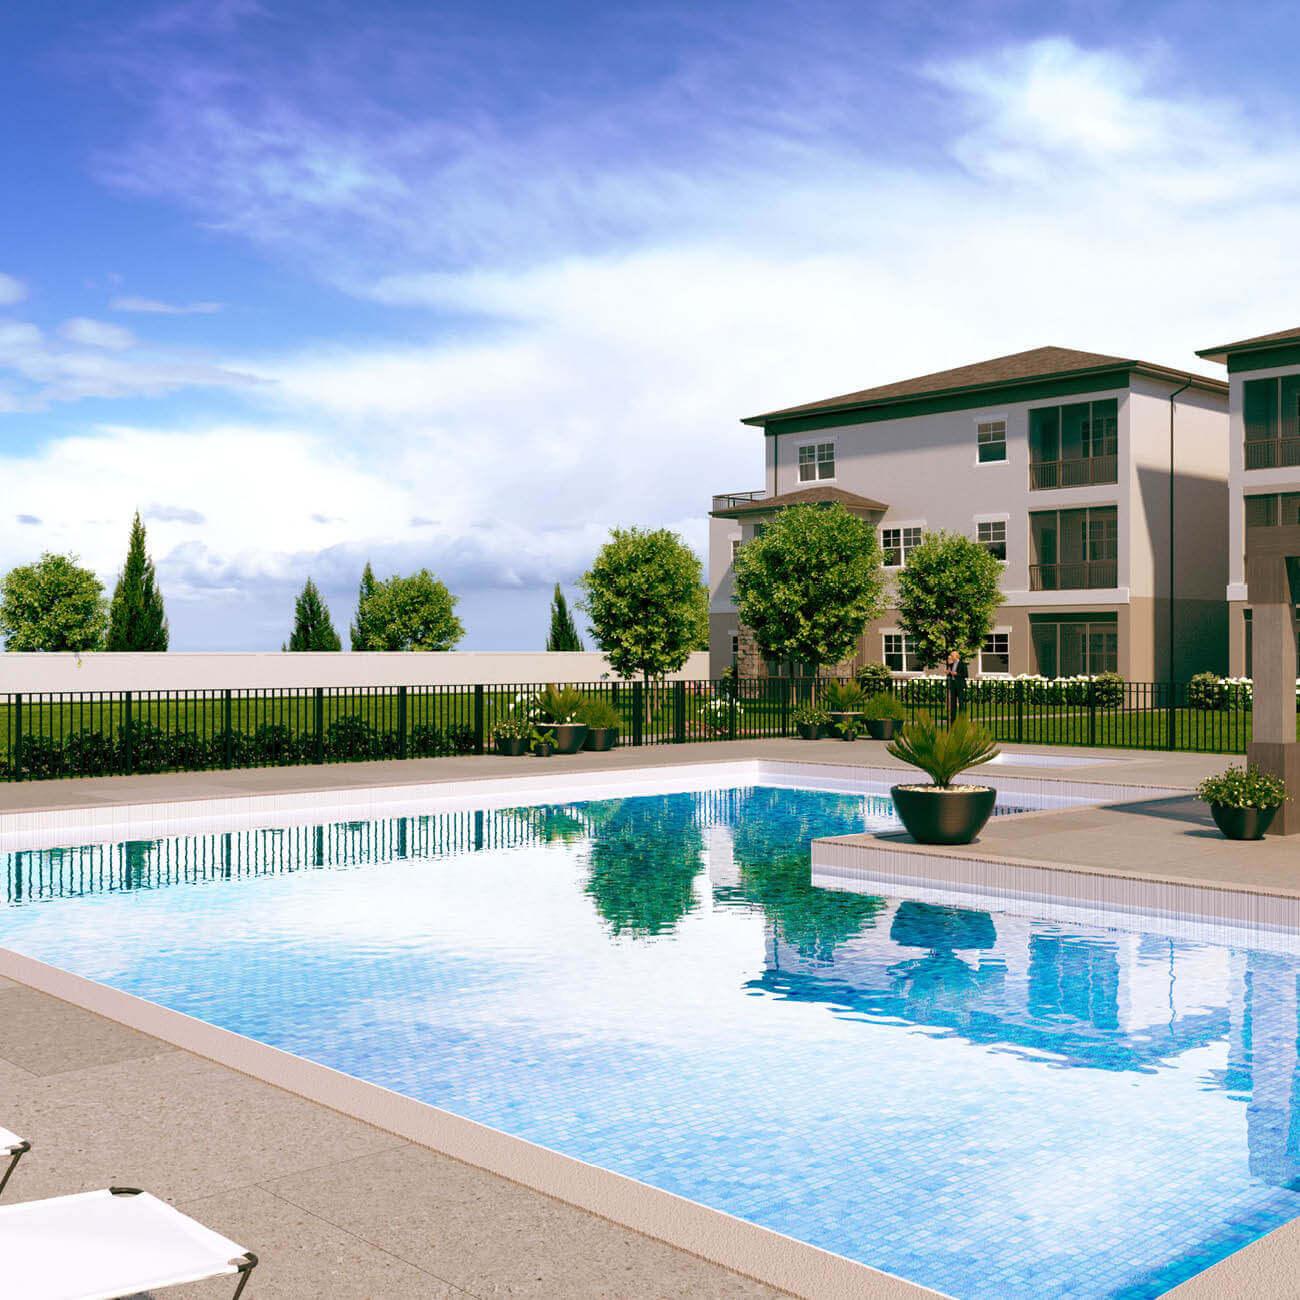 3D rendering of community outdoor swimming pool